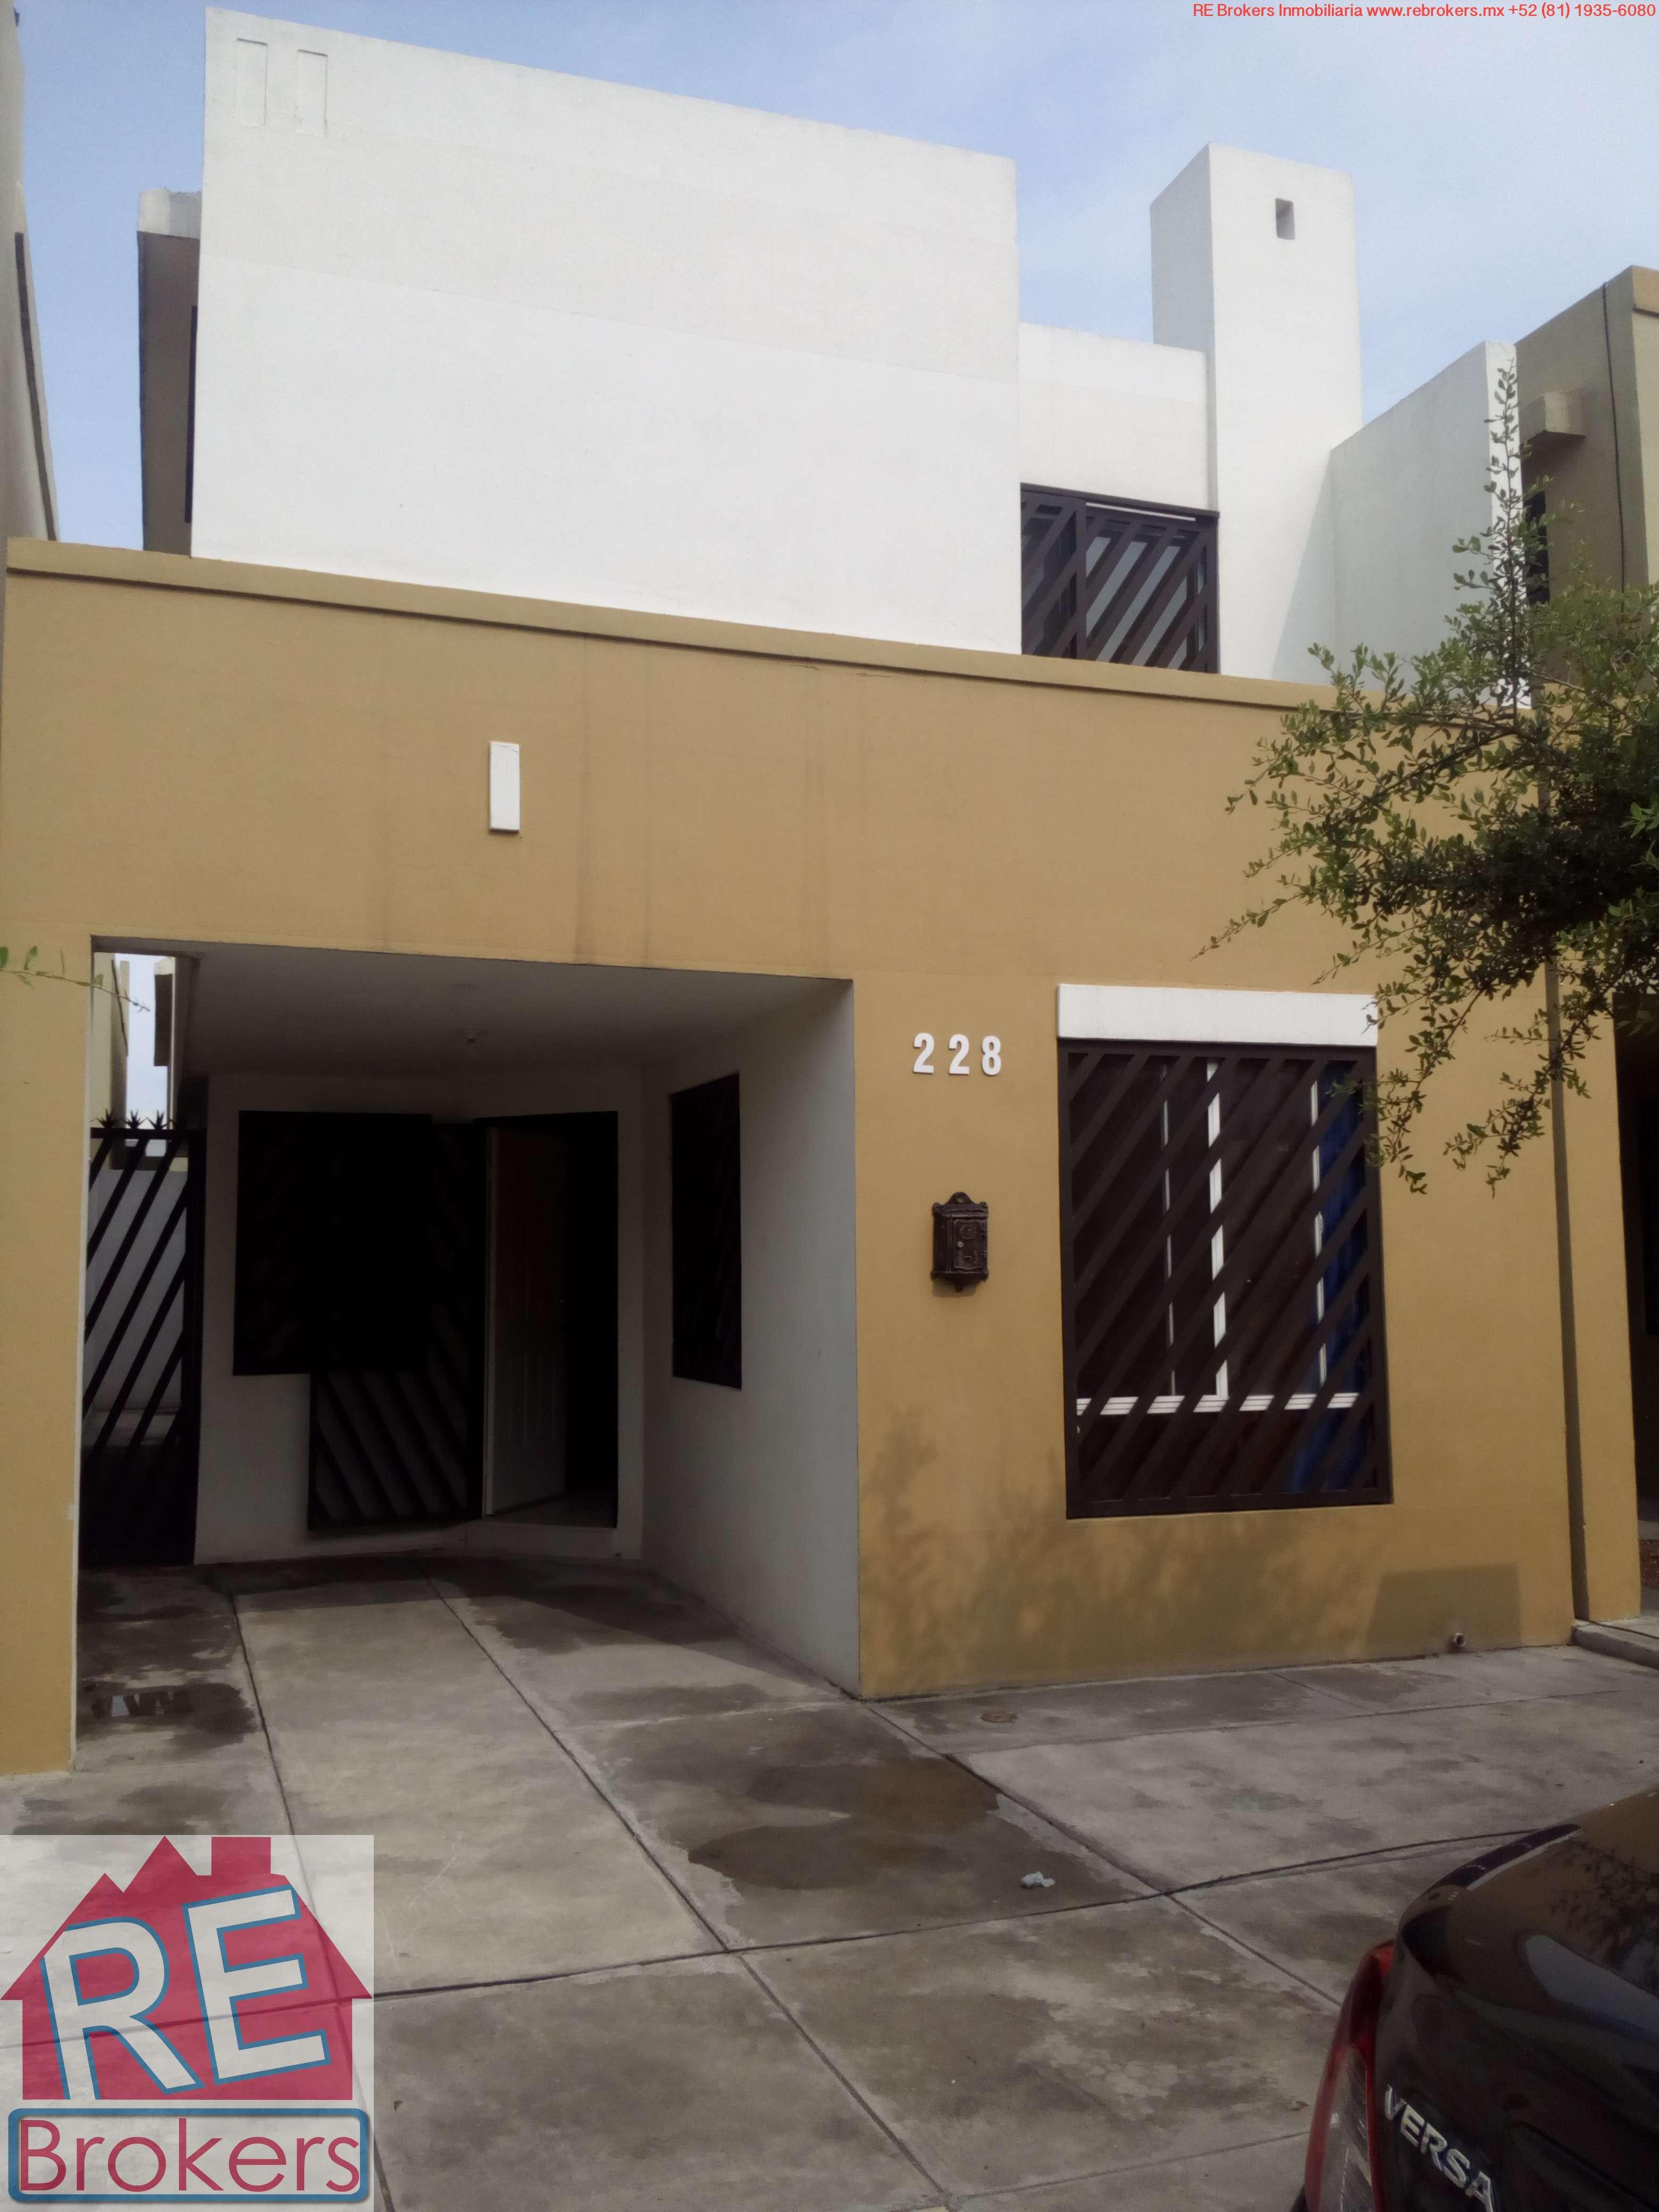 Casa en renta en nova apodaca goplaceit for Casas en renta en apodaca